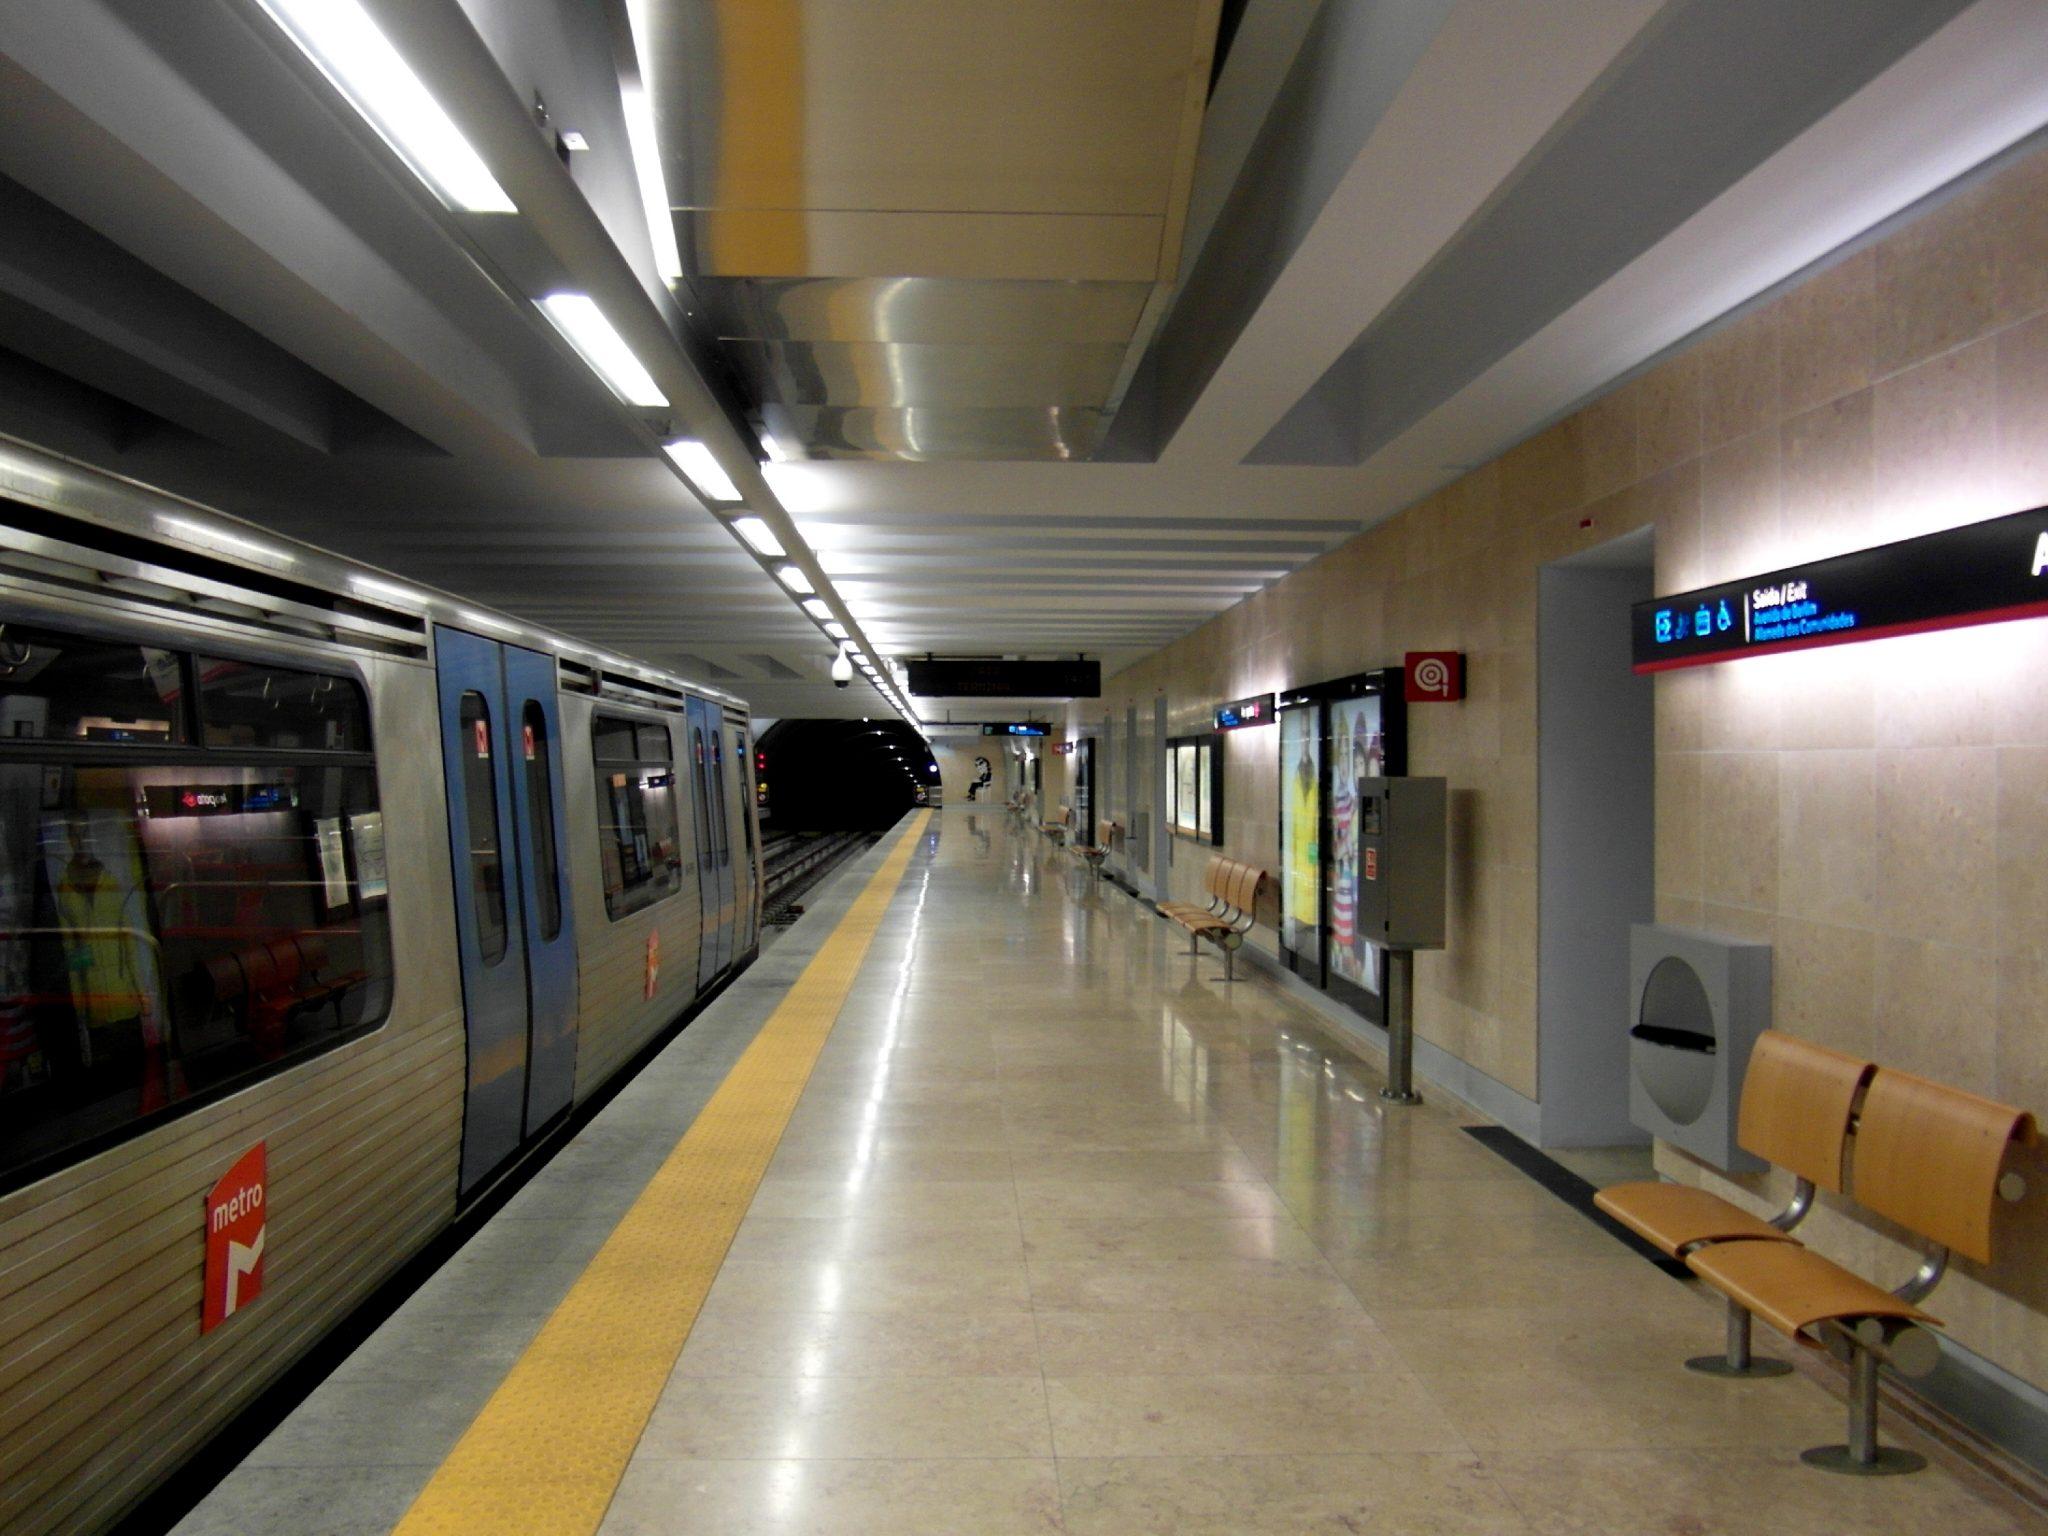 Metro de Lisbonne - Station Aeroport - Photo flickr de Ingolf